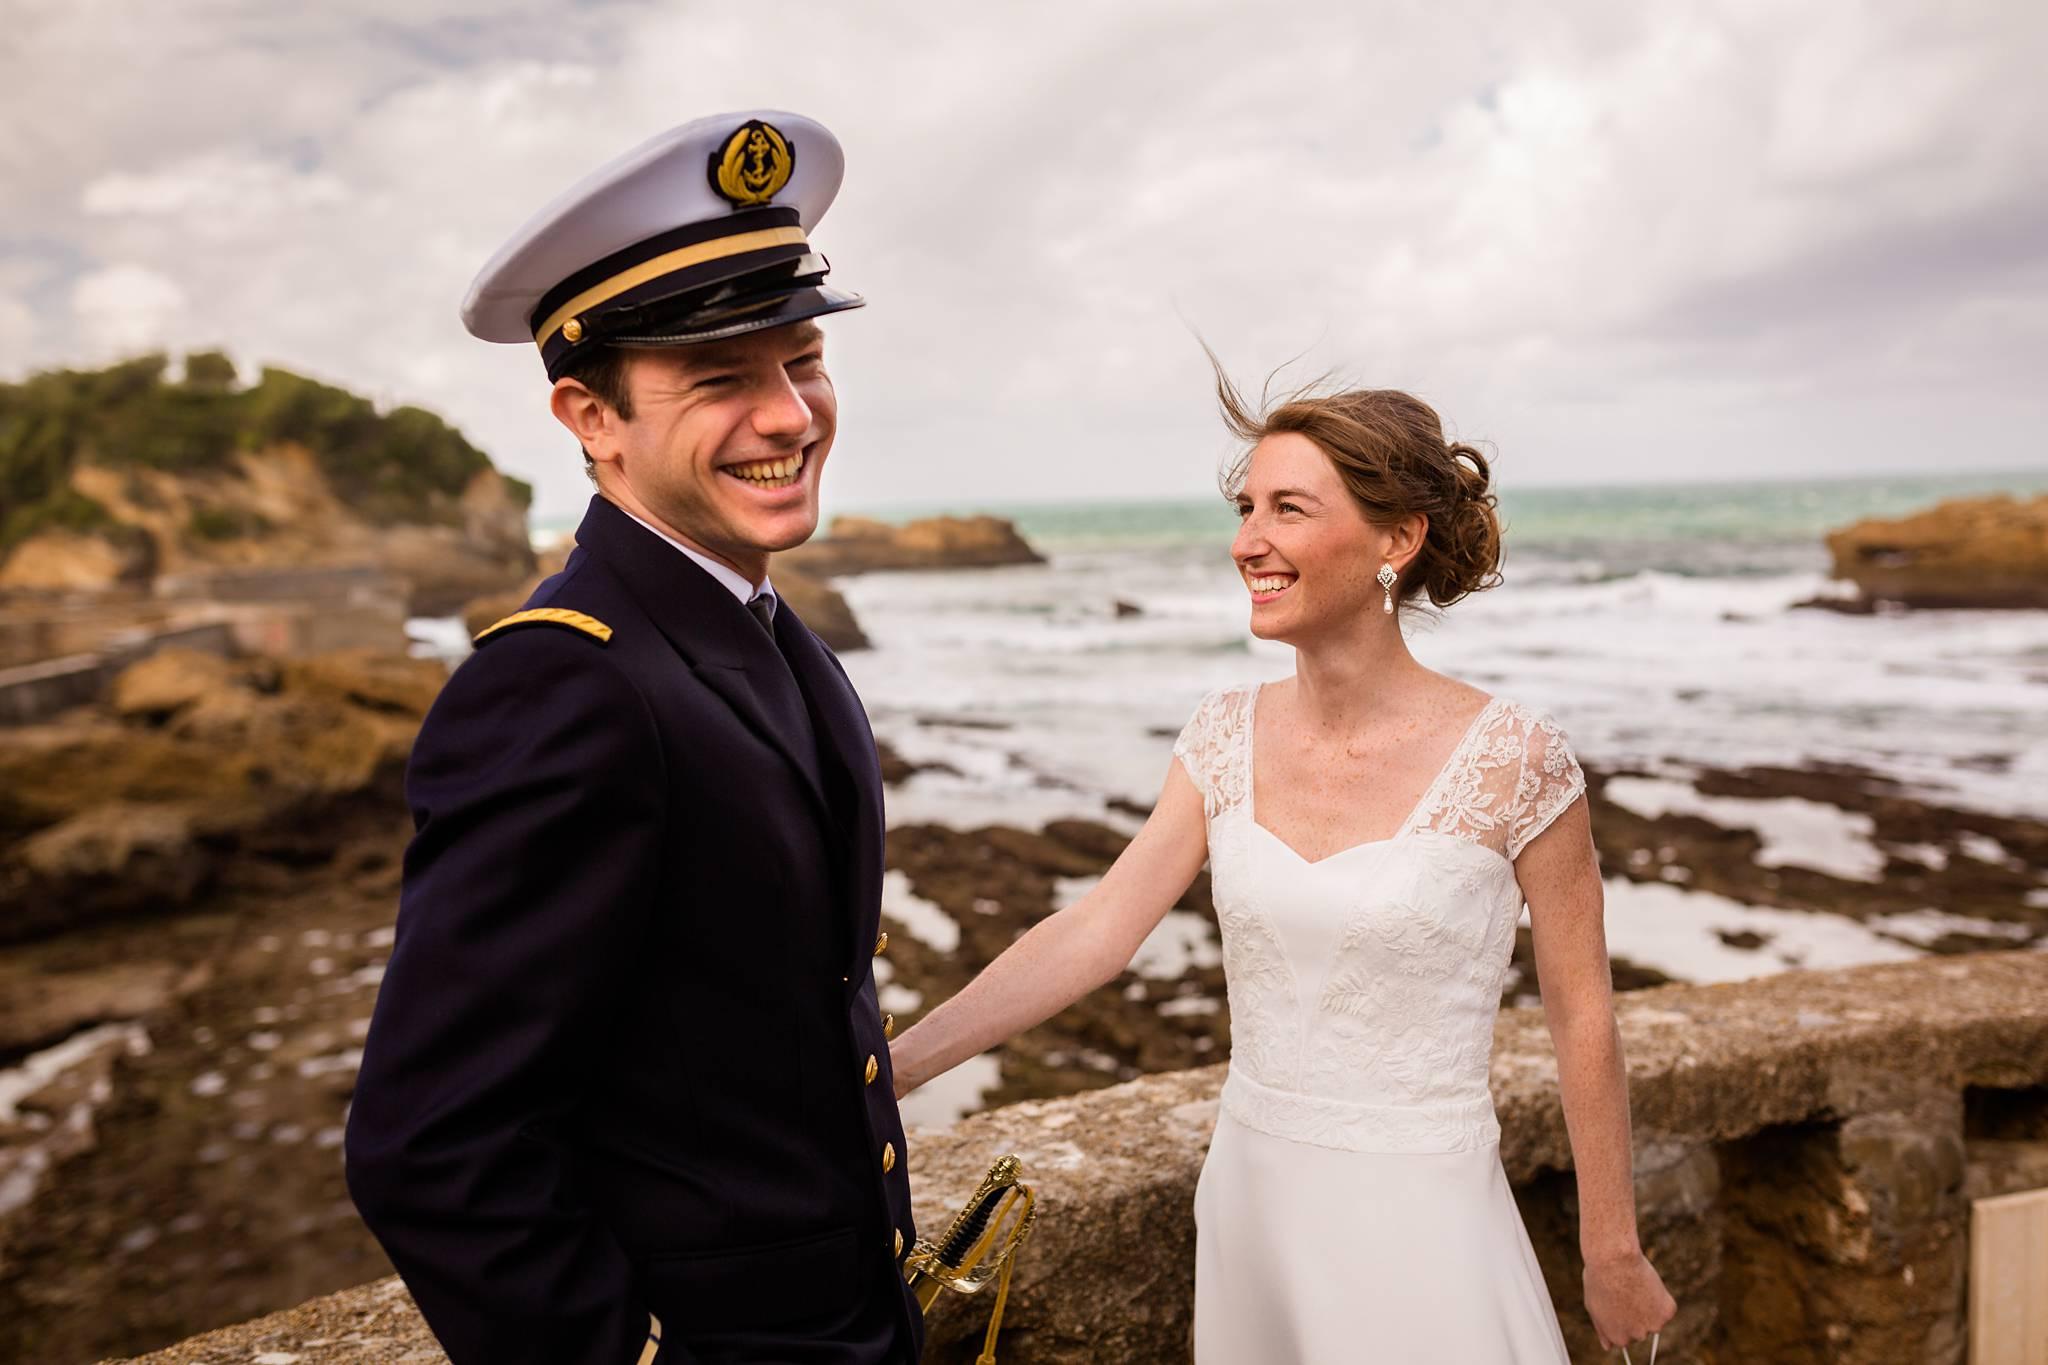 04_mariage-pays-basque-biarritz-fm